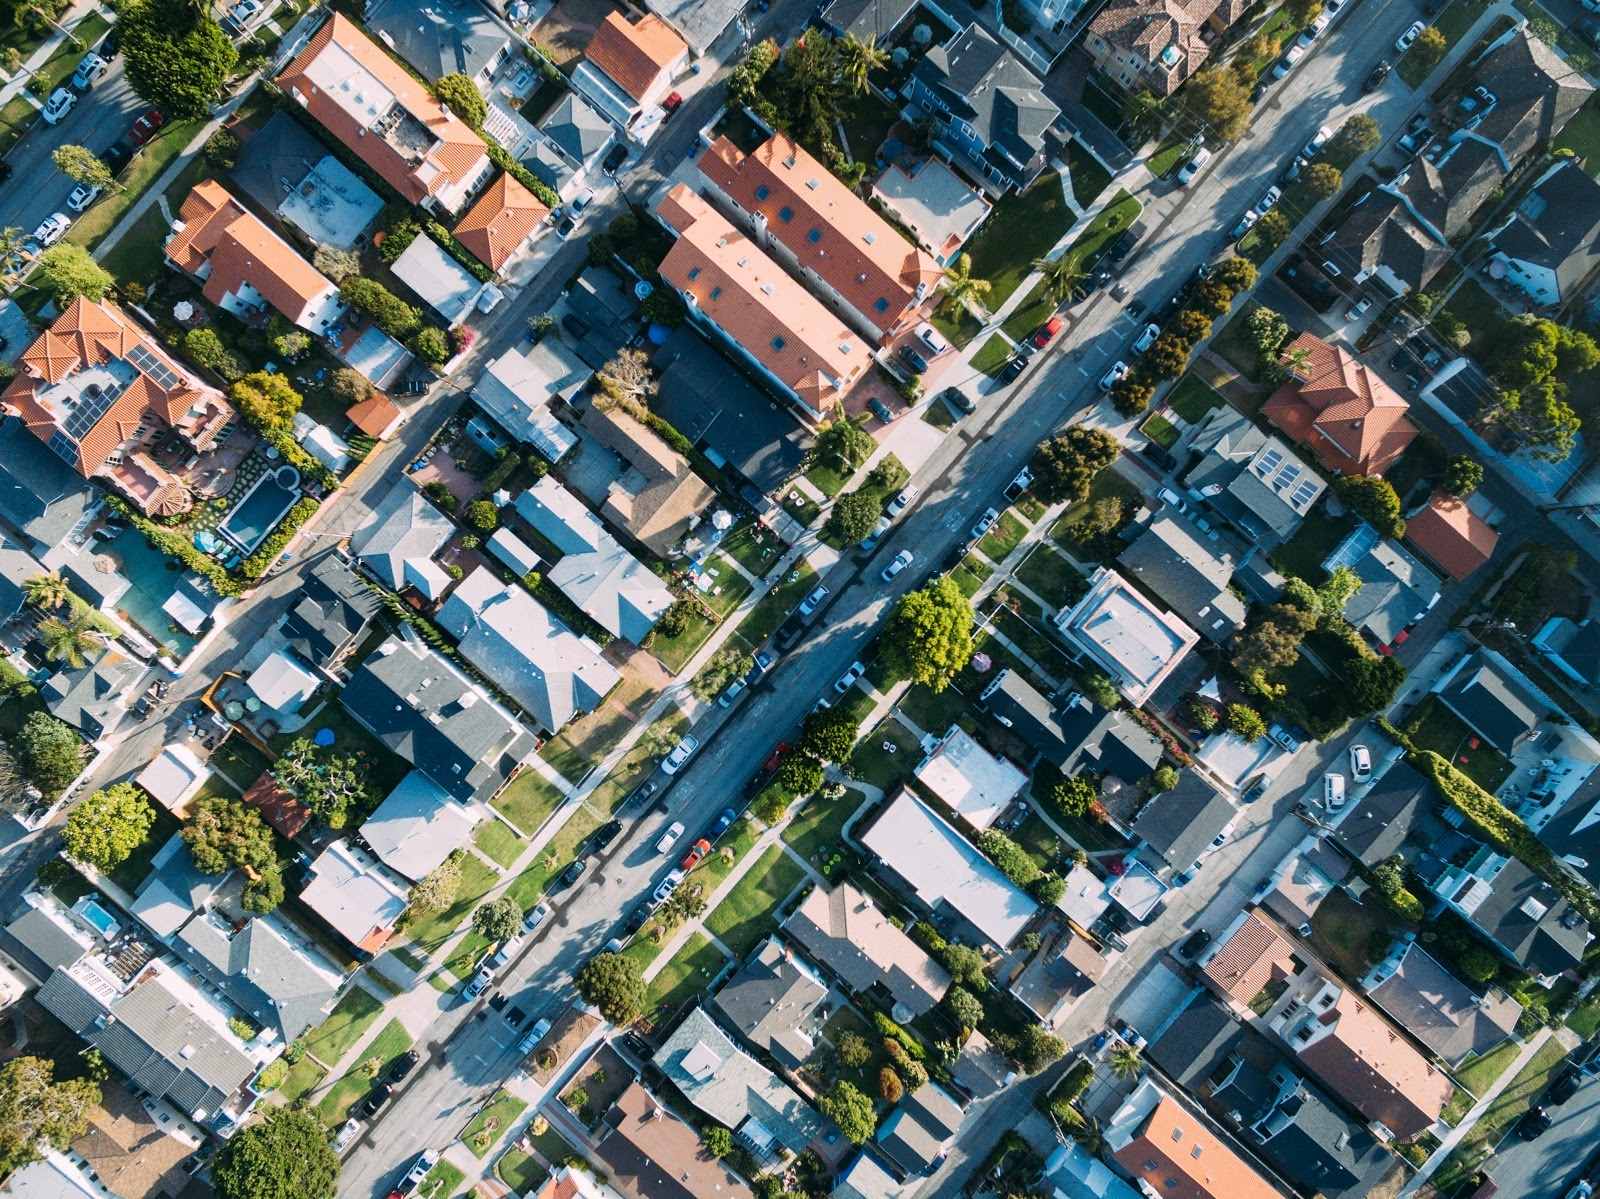 Aerial picture of an urban neighbourhood